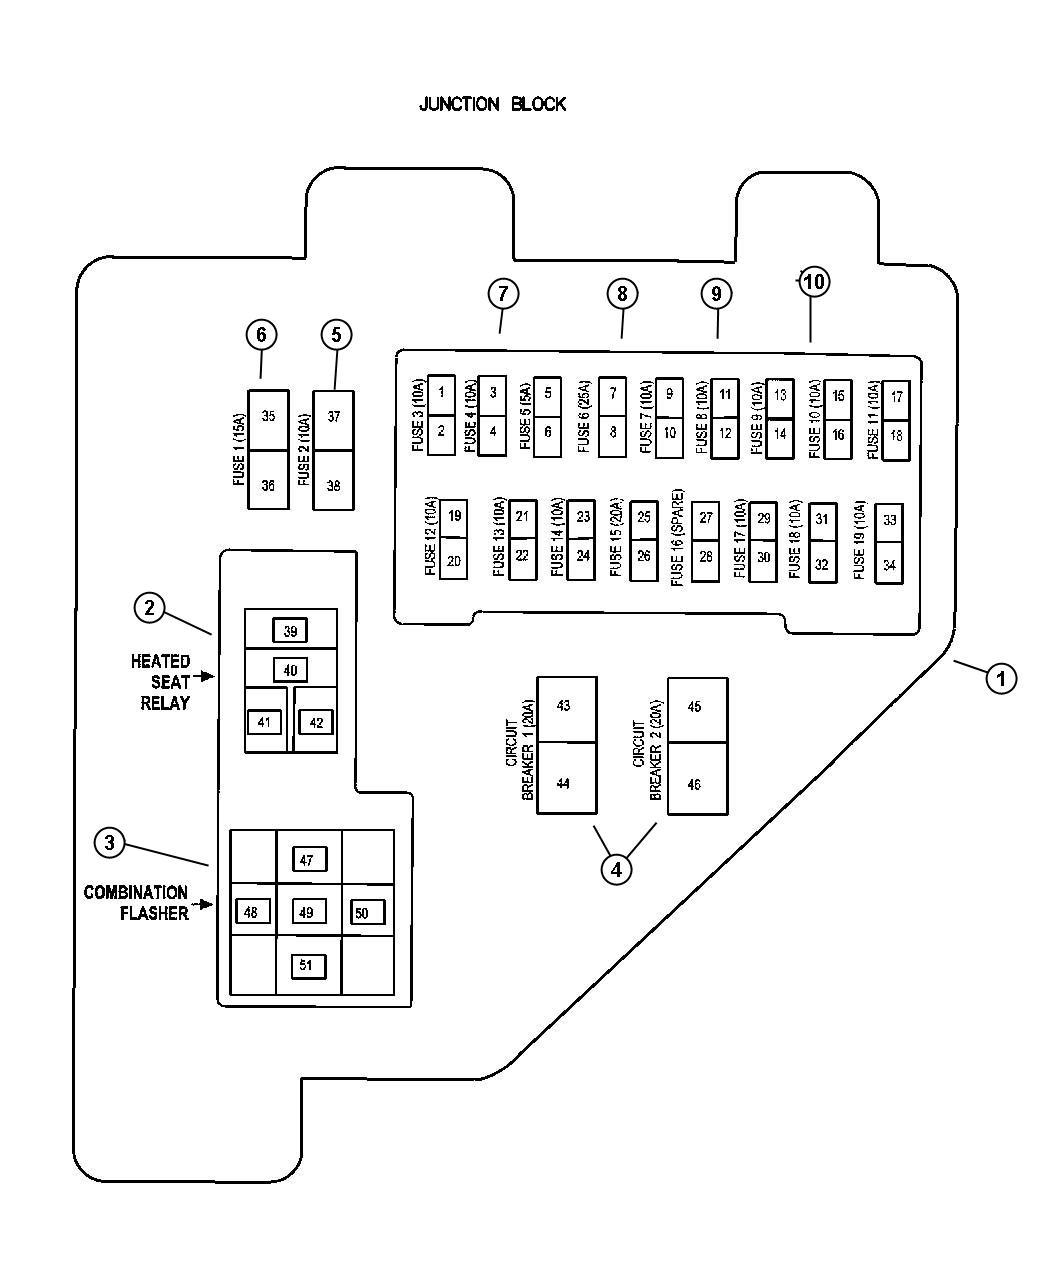 2004 dodge ram fuse box diagram john deere stx38 yellow deck wiring 1999 nissan quest vacuum line free engine